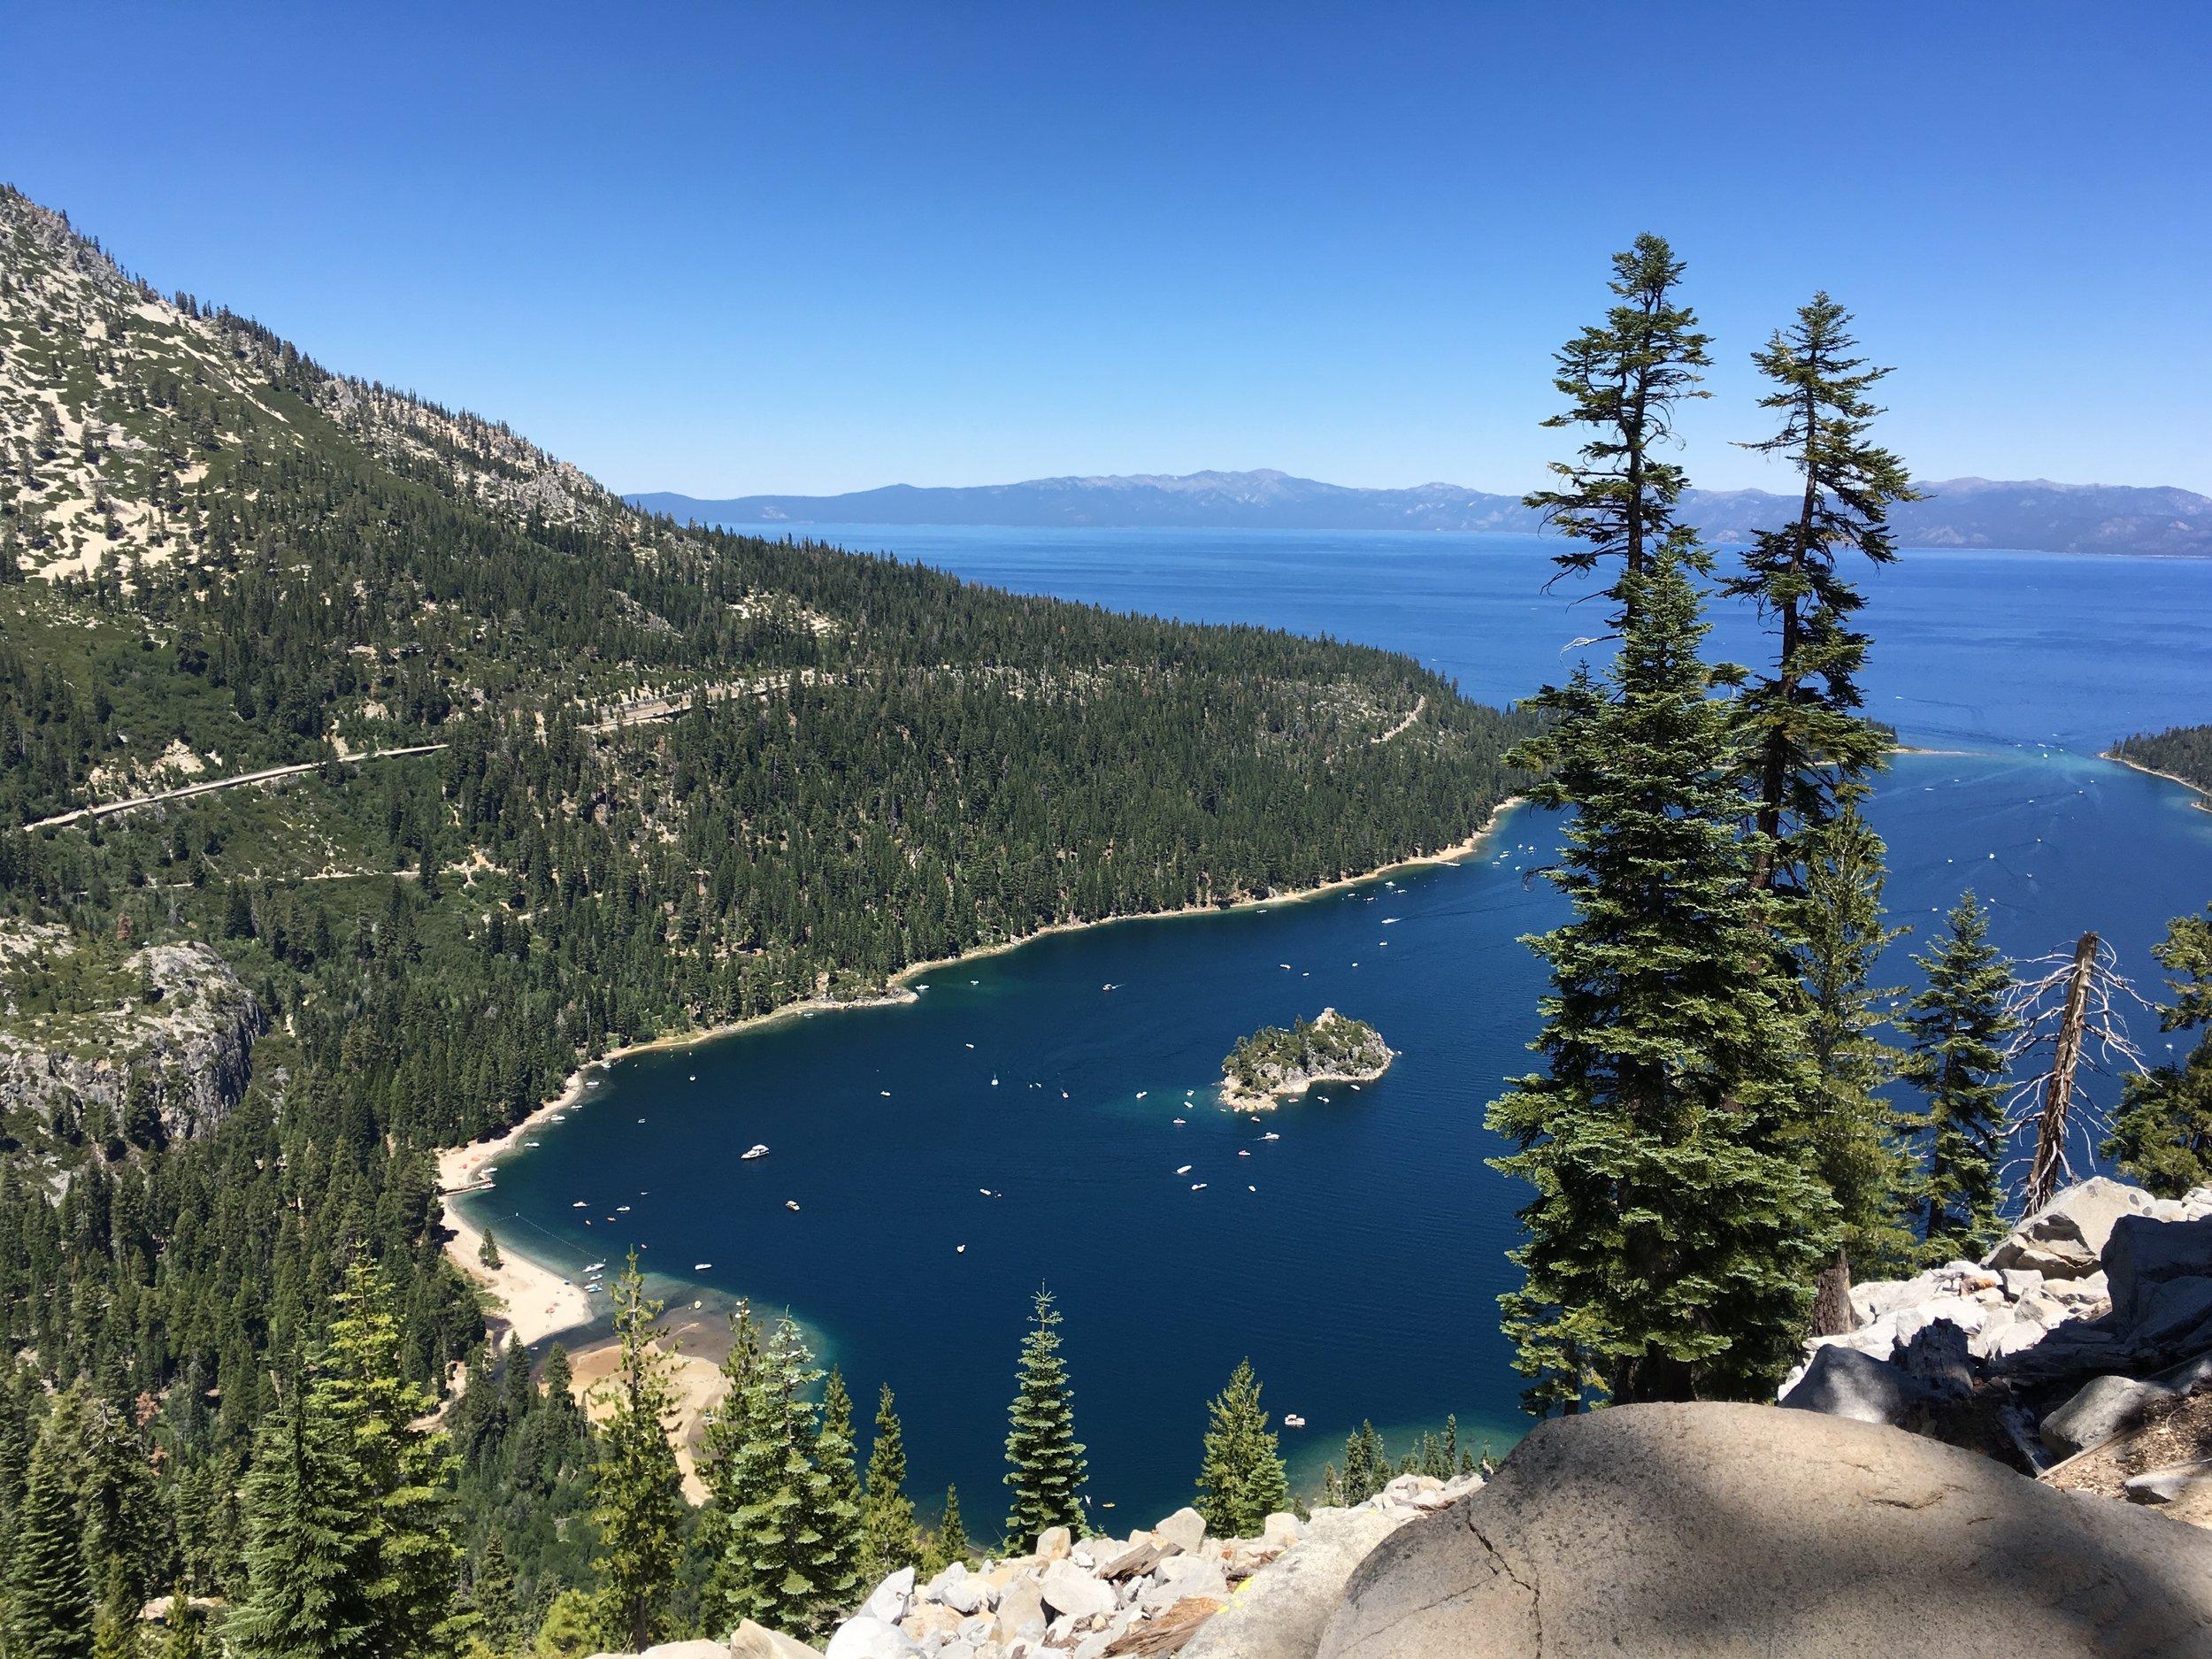 Lake Tahoe, California - July 2016